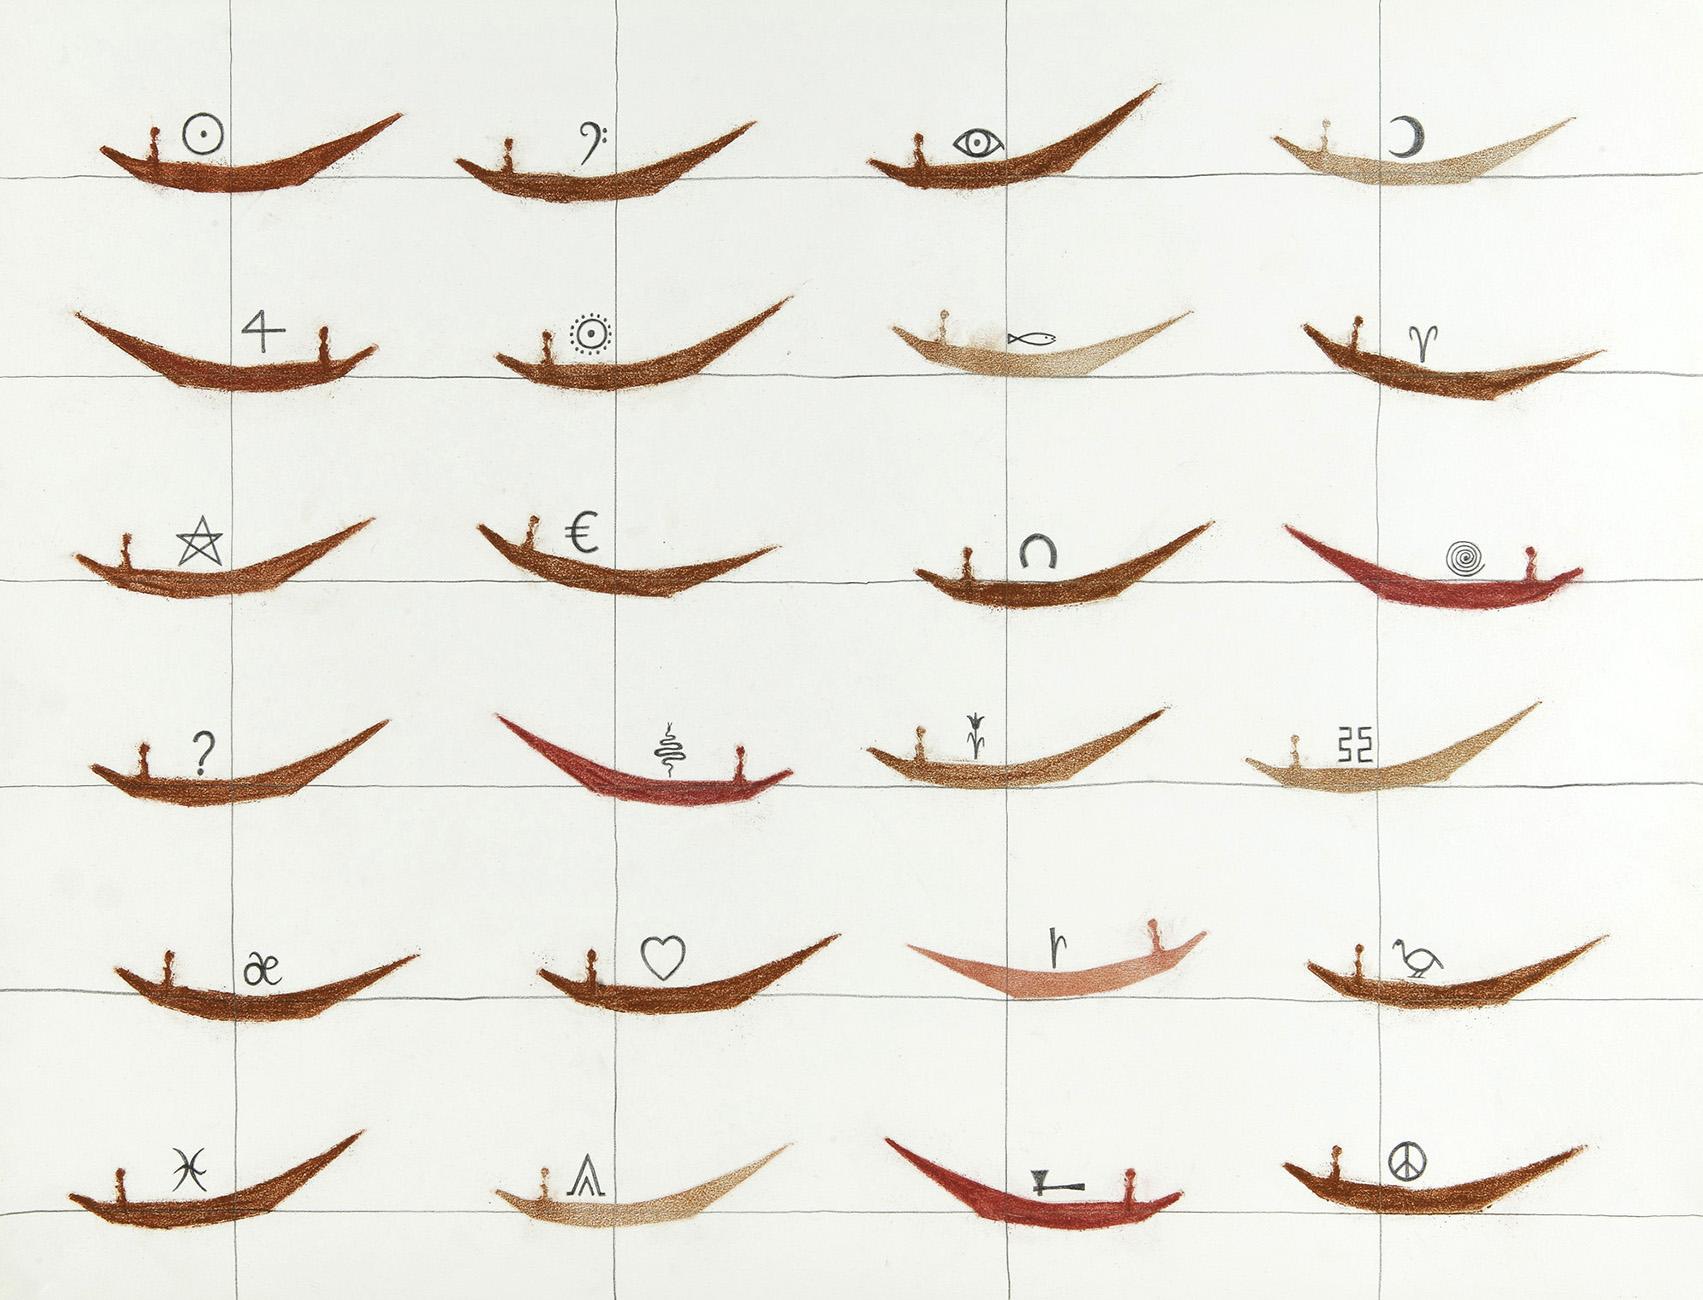 Bestemming - potlood & pastelkrijt - 50x70 cm - verkocht